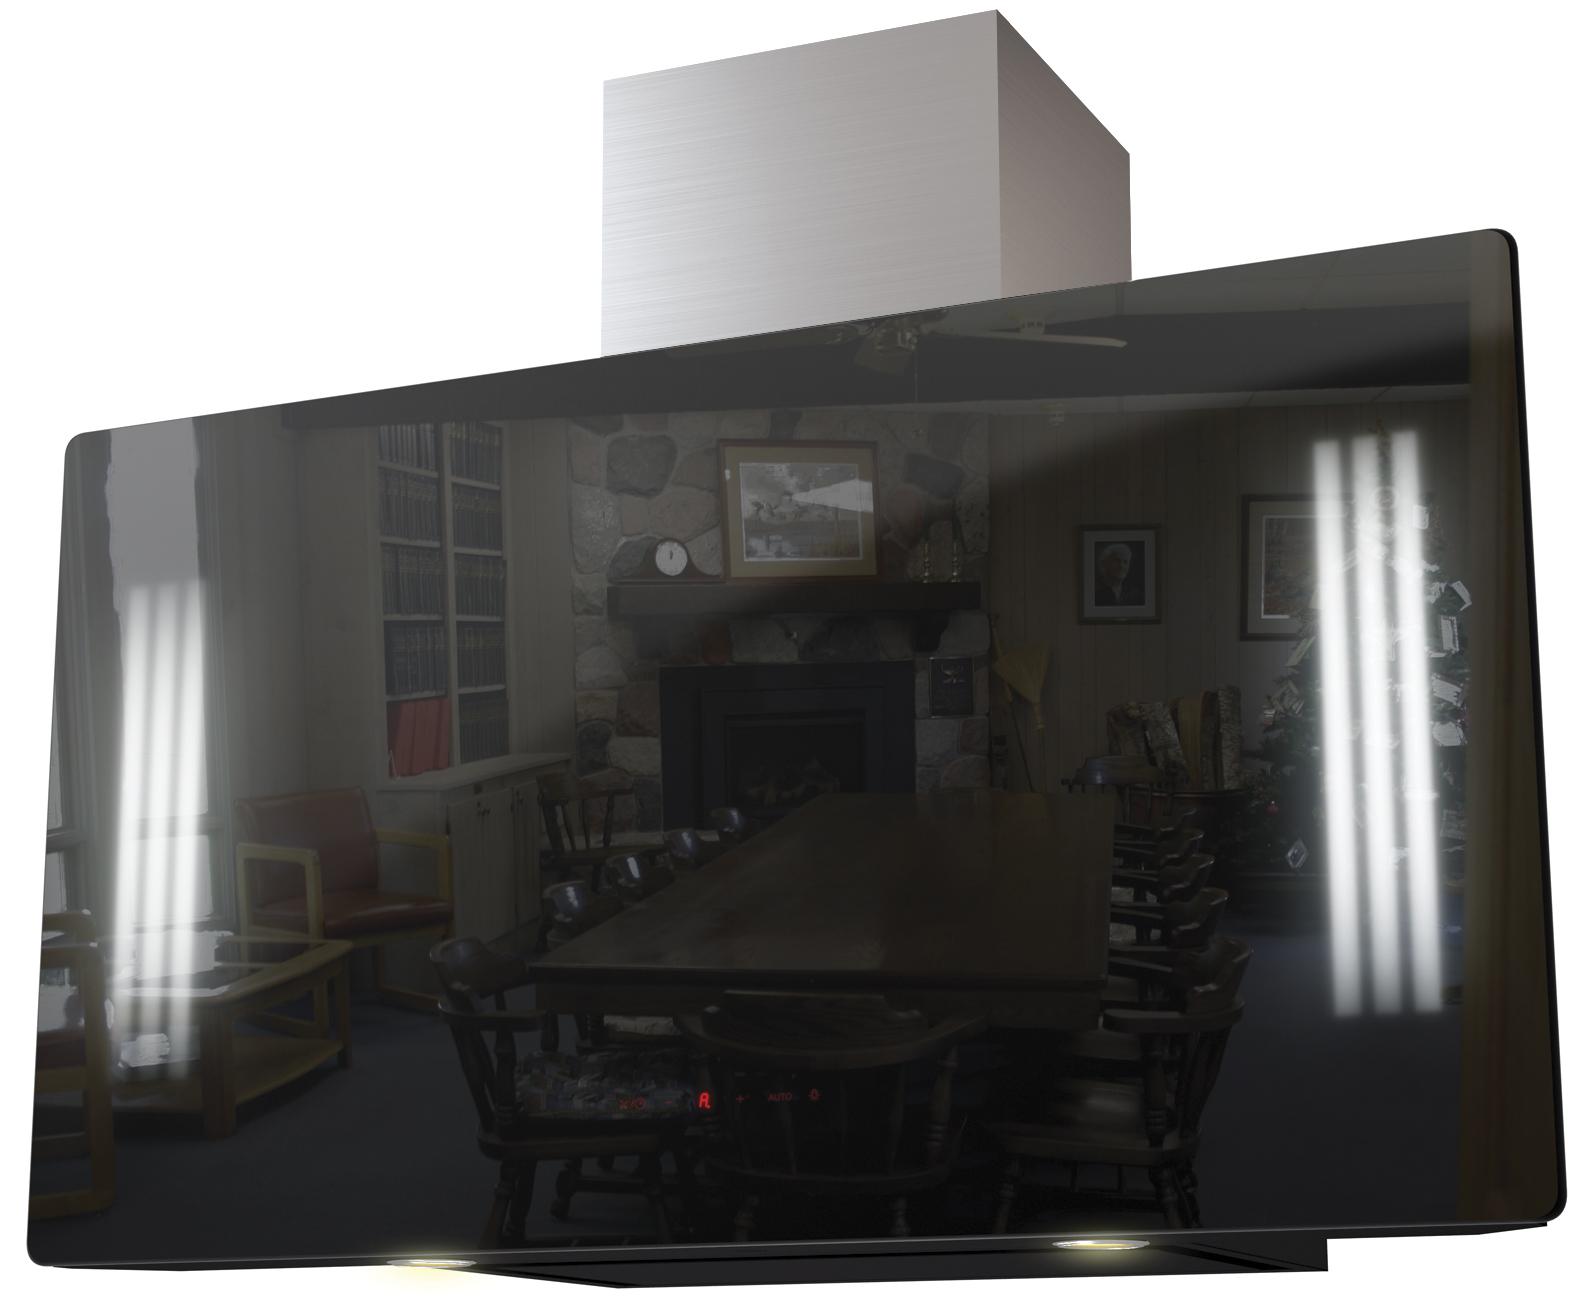 NAOMI Silent mirror 900 black 5P-S, стоимость 80 248 руб.